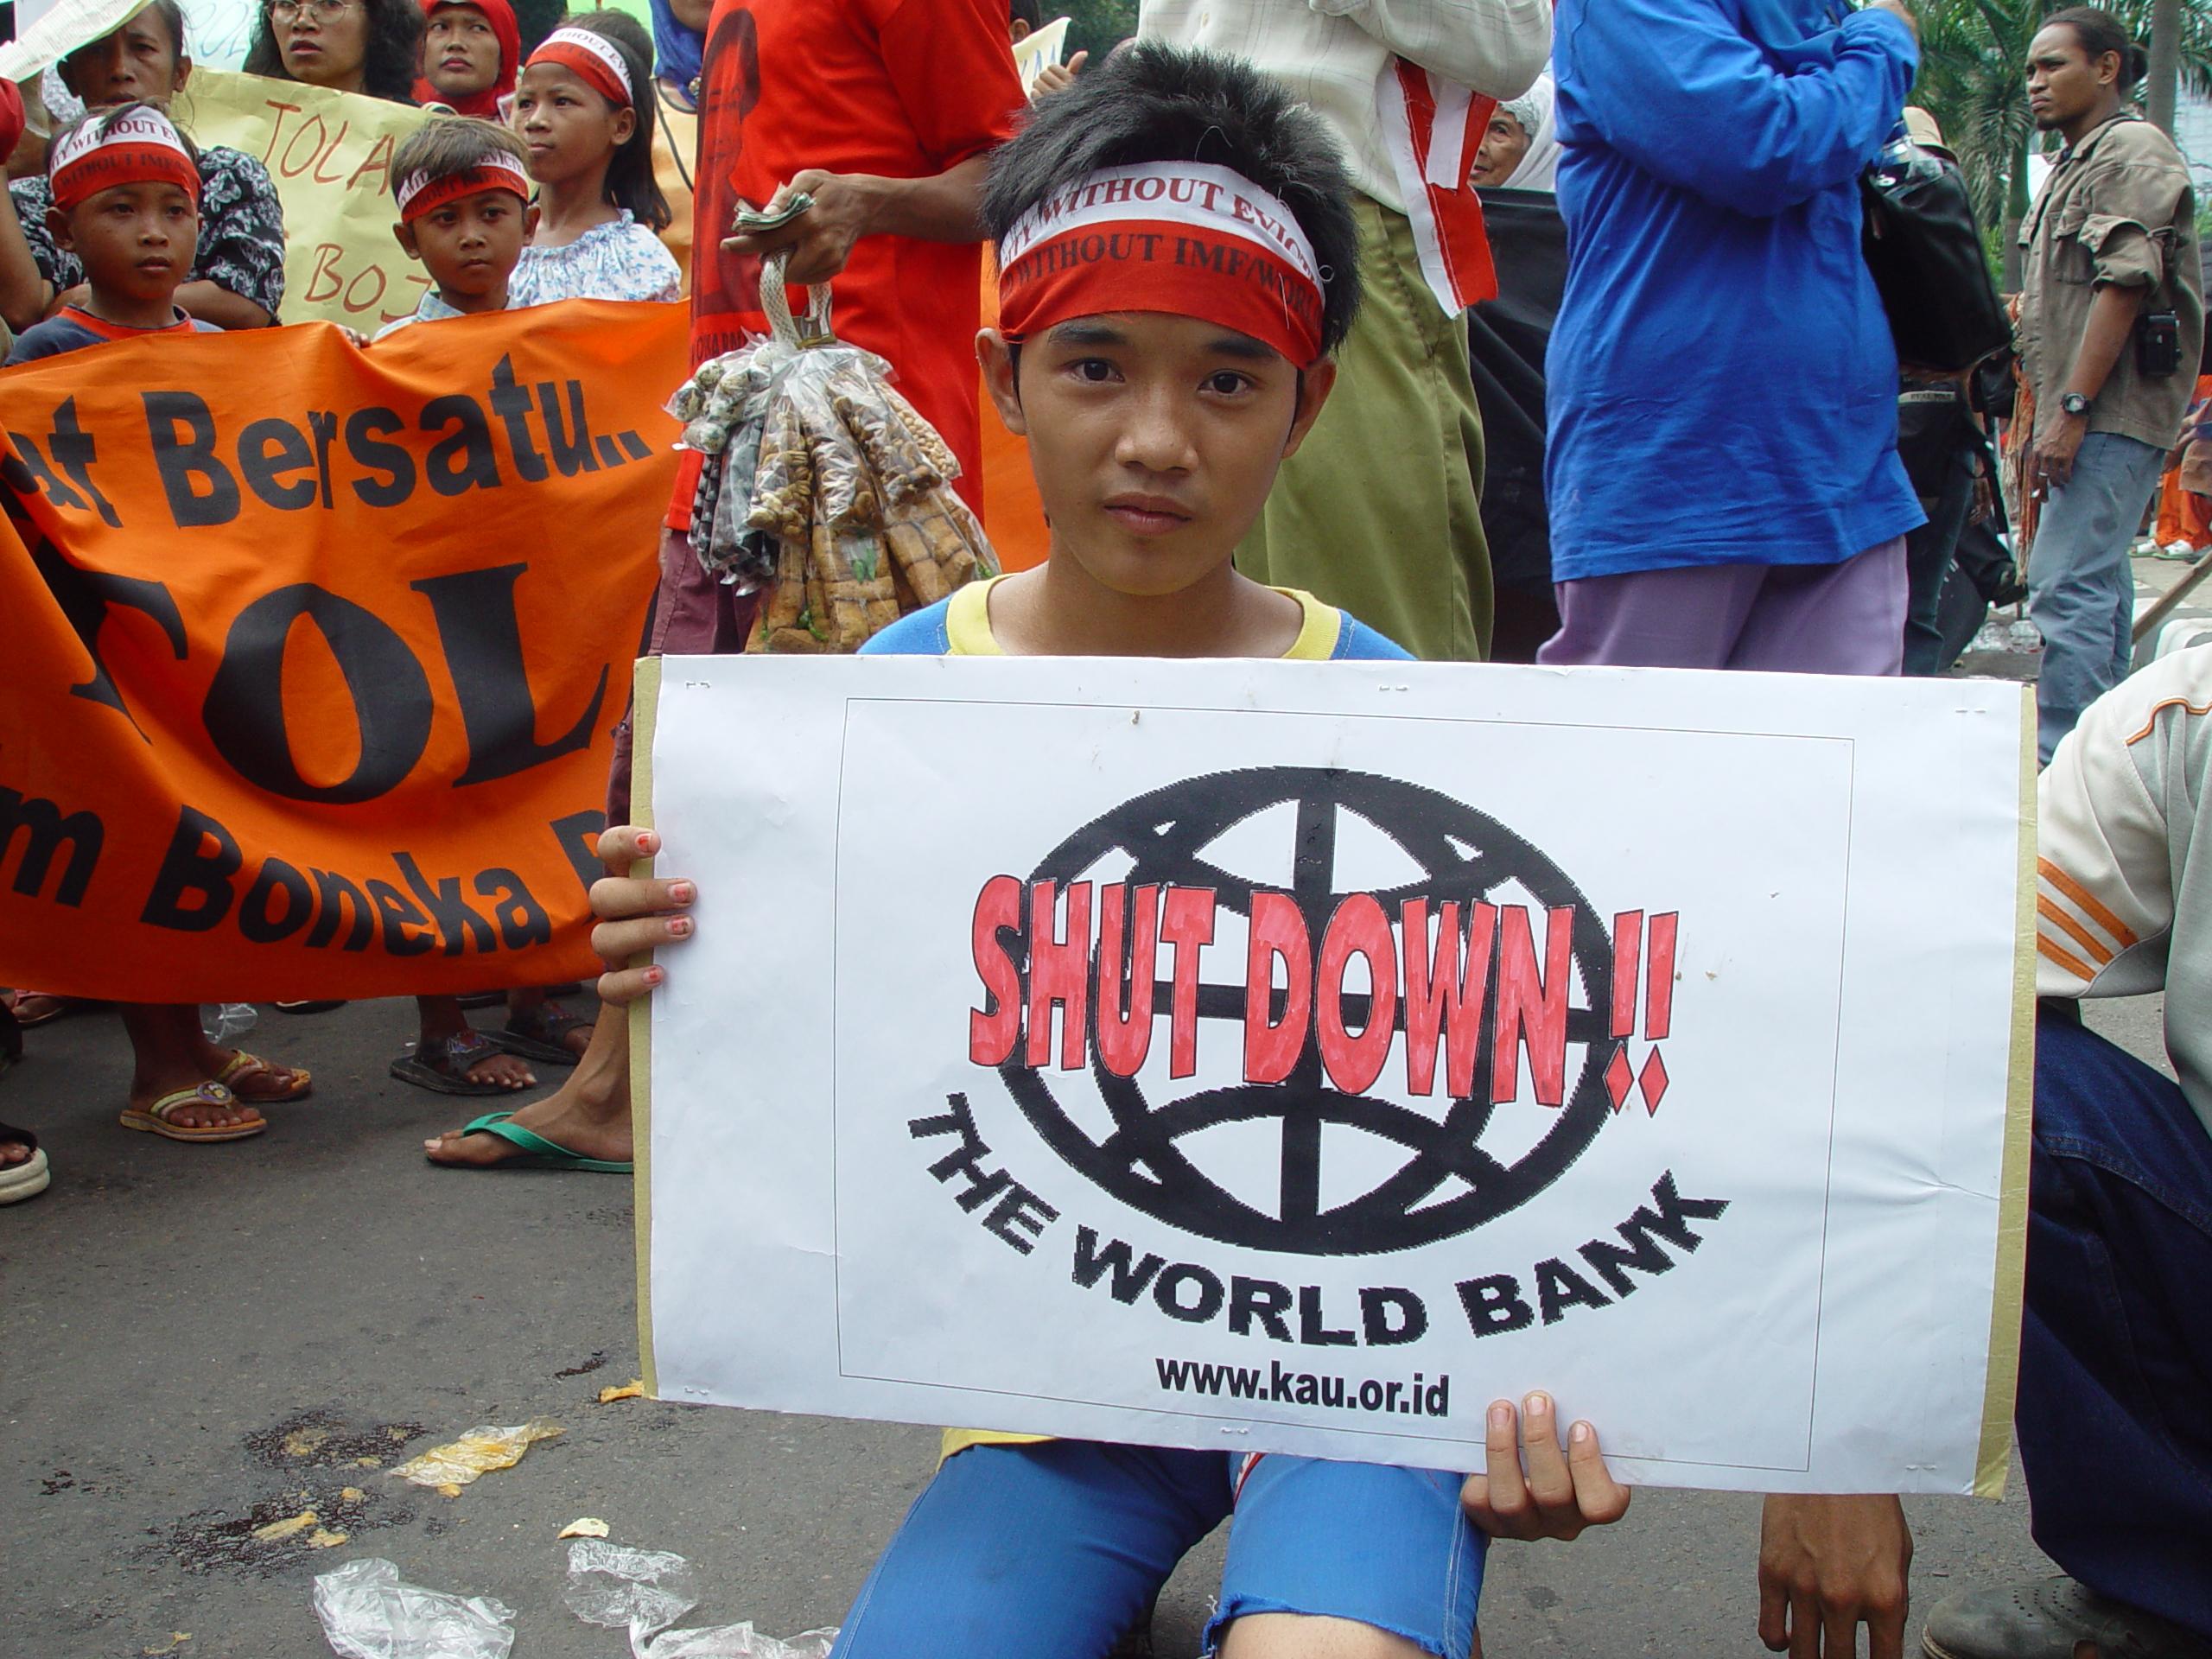 World Bank Protester, Jakarta, Indonesia.